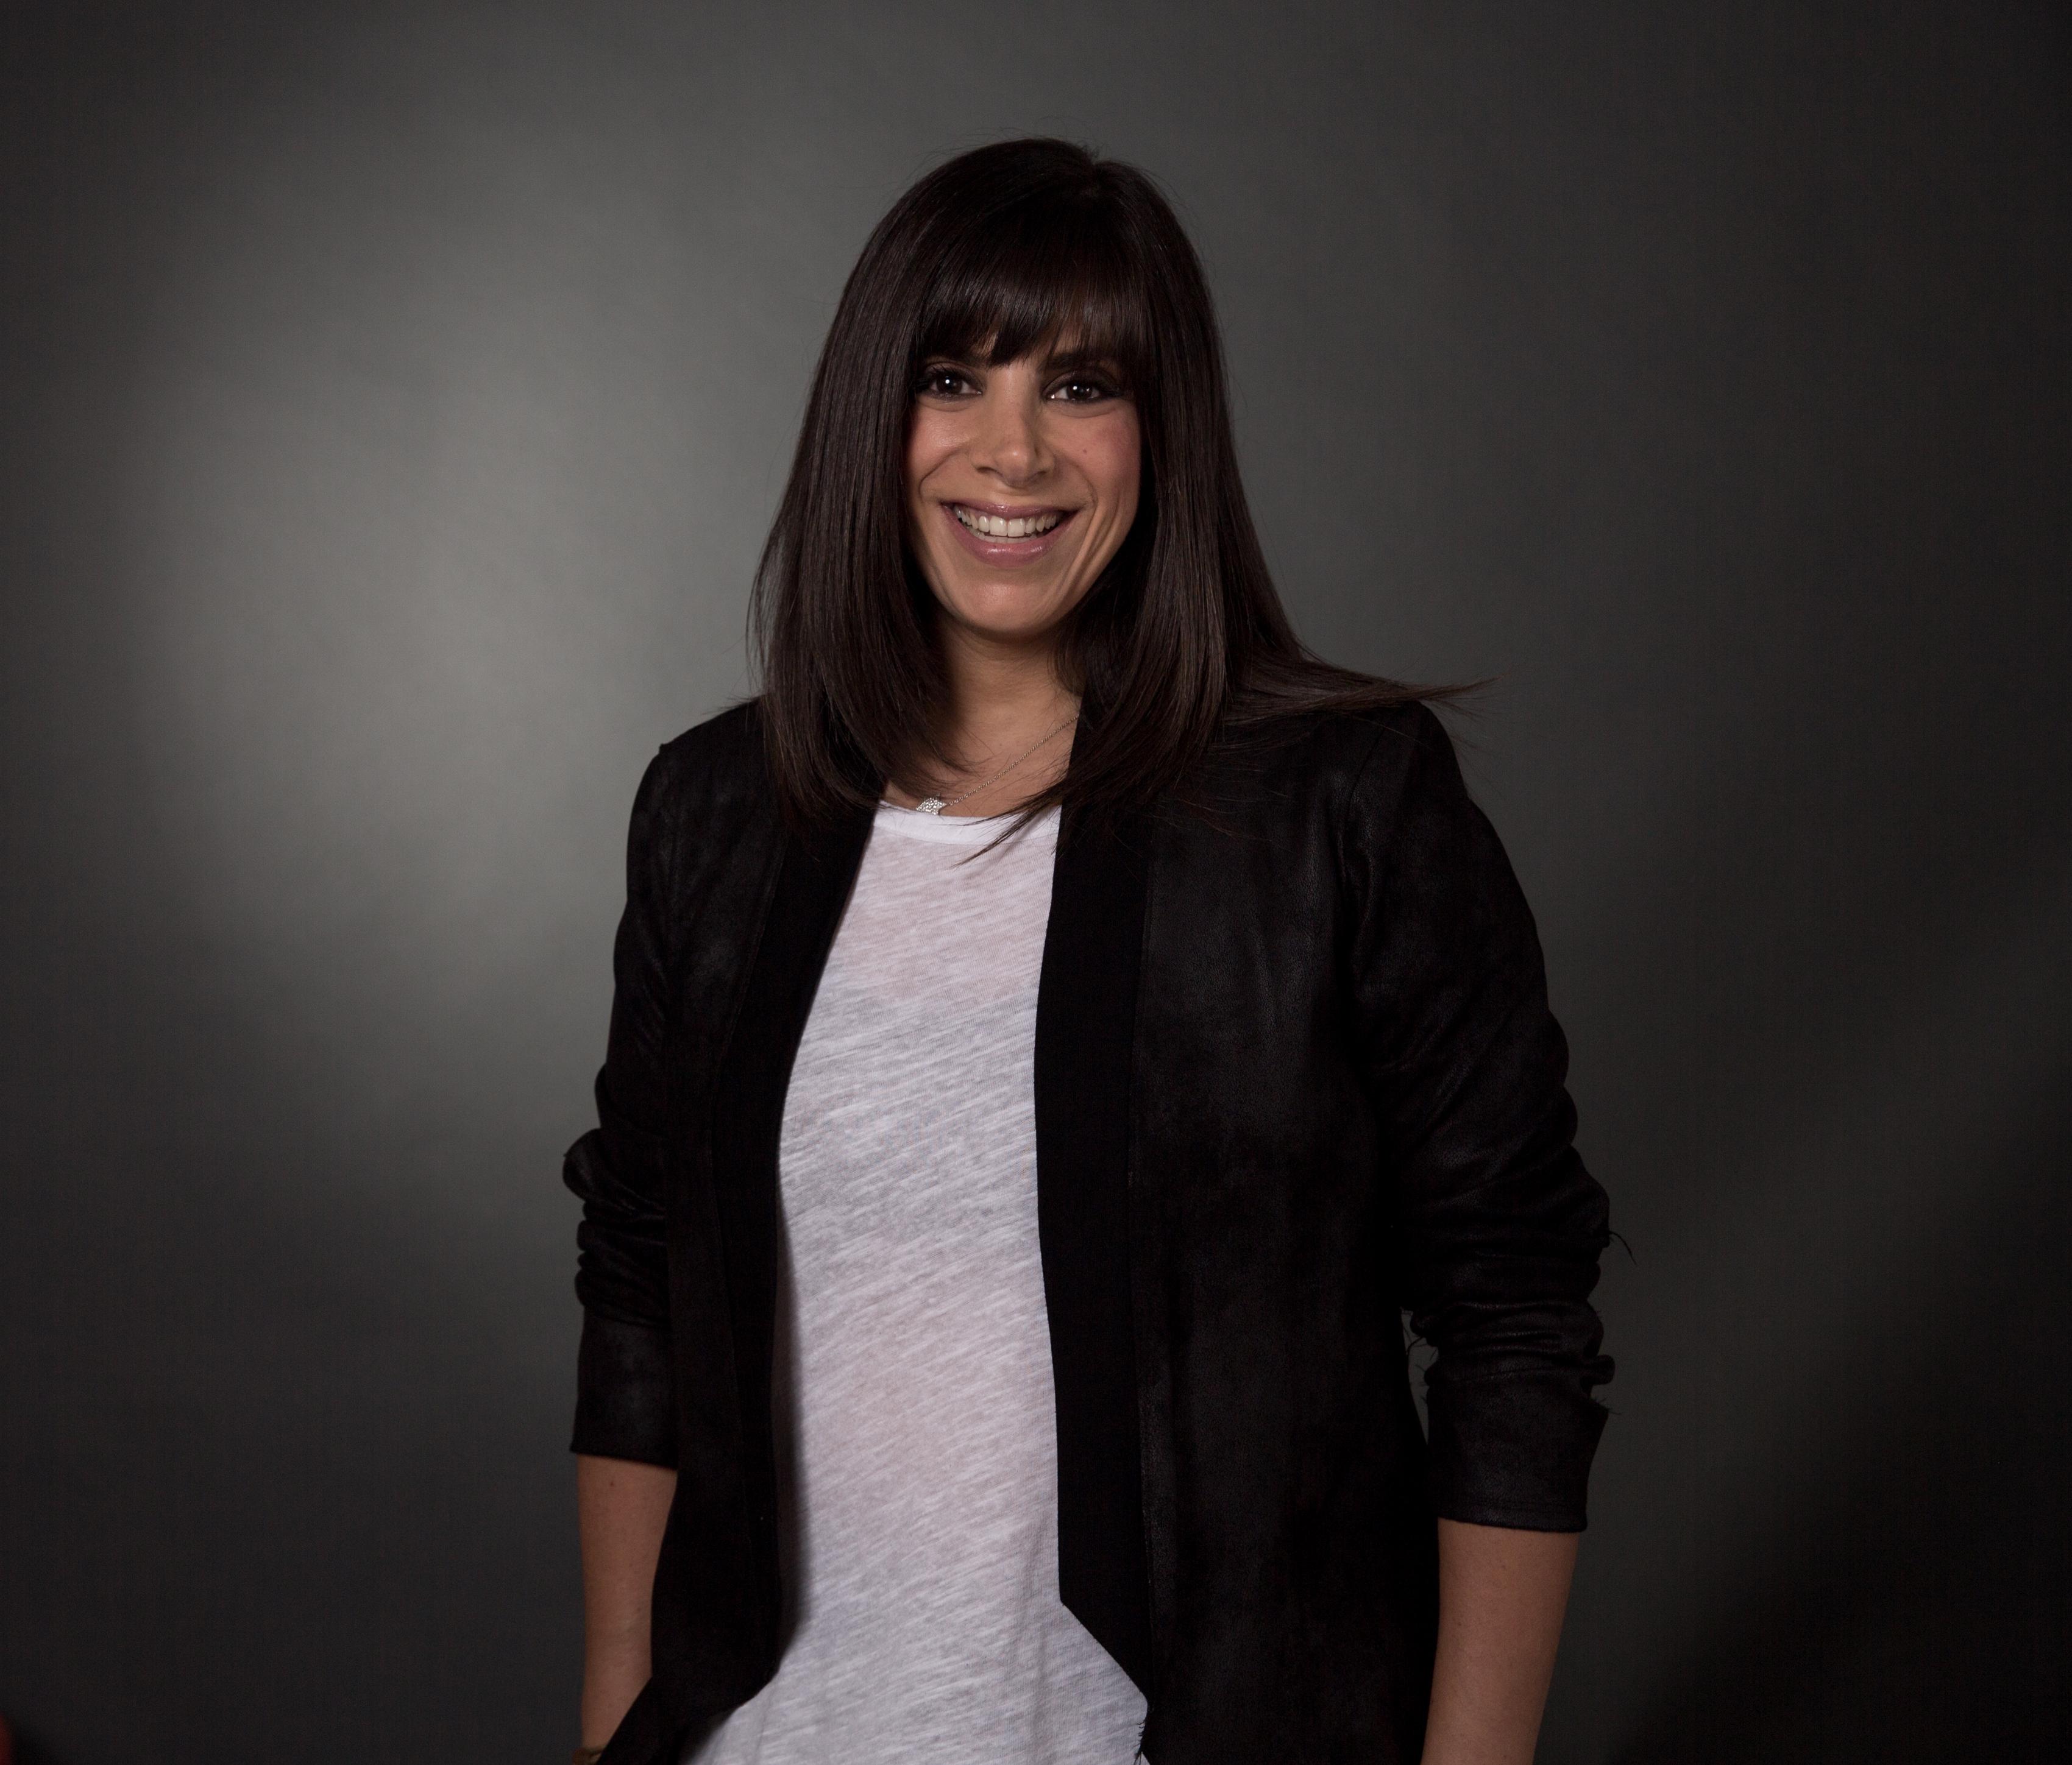 Debra Delshad